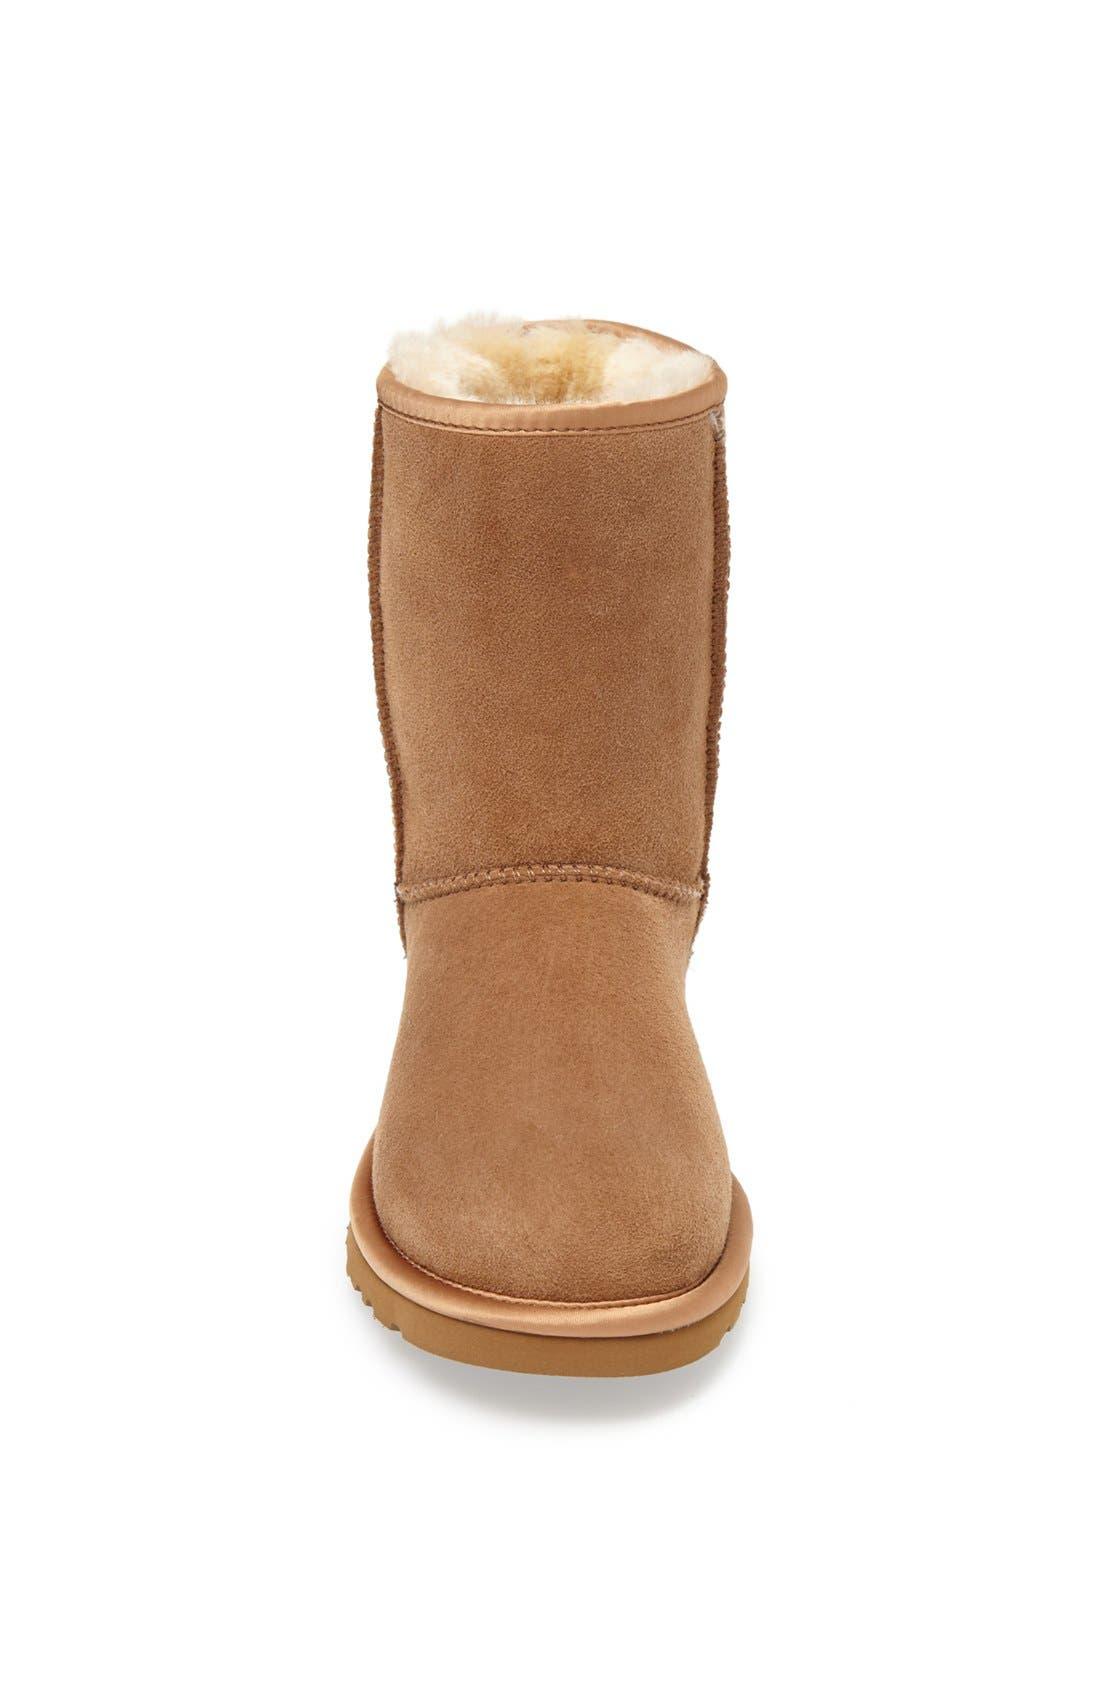 Alternate Image 3  - UGG® Australia 'Classic Short' Metallic Patent Boot (Women)